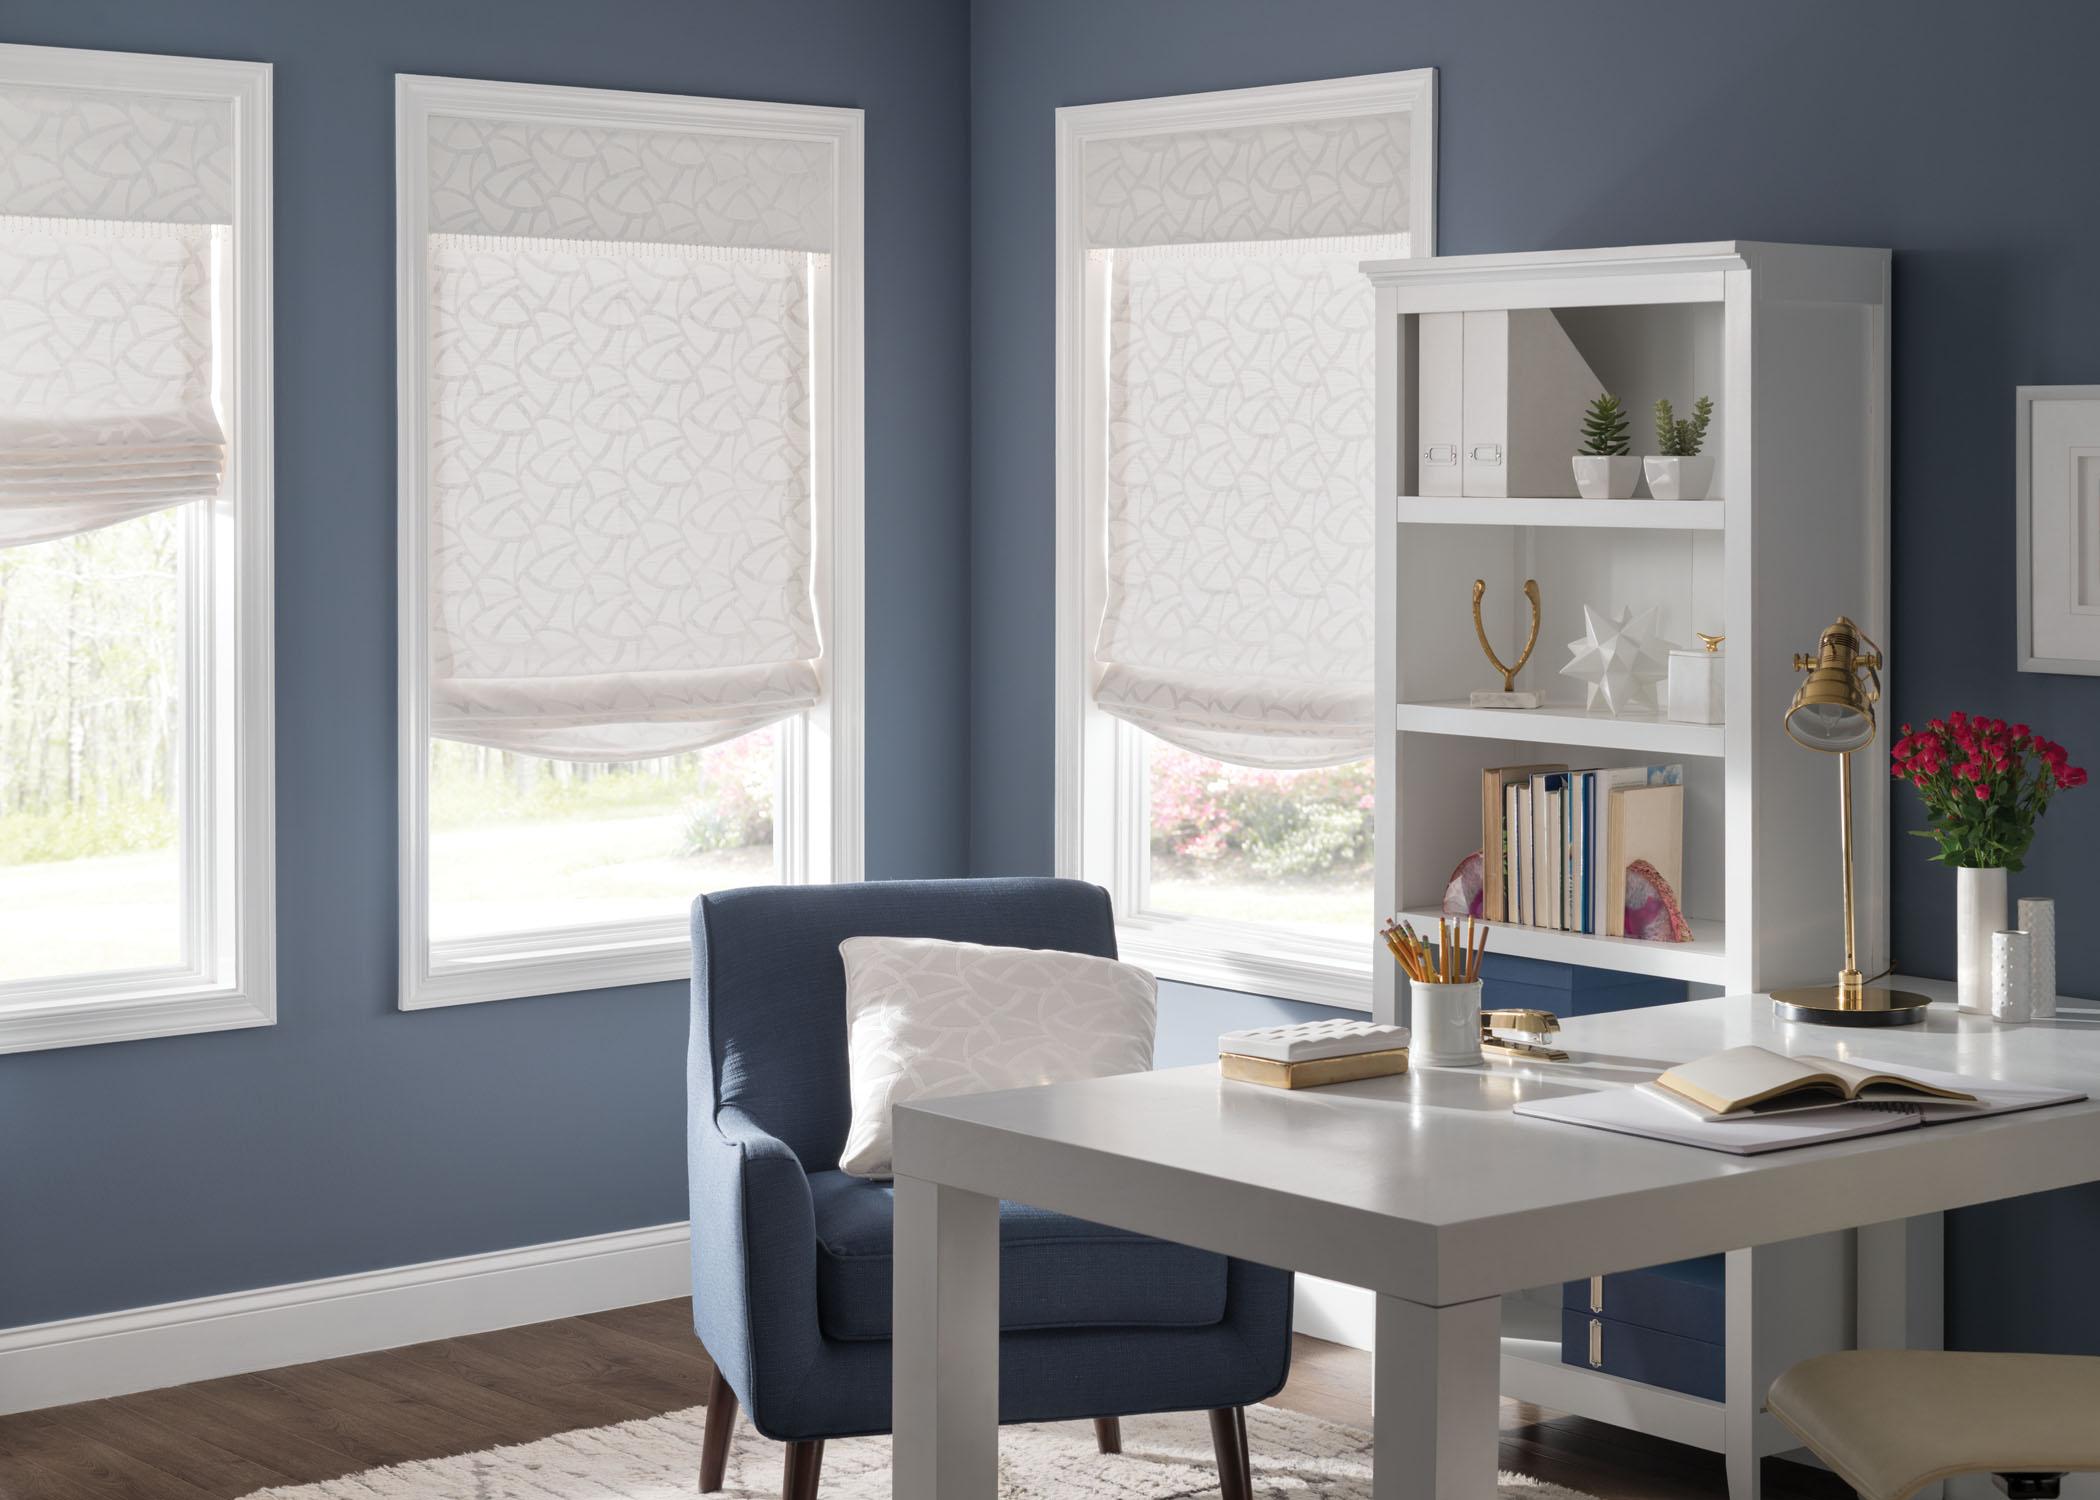 graber-fabricshades-office1-light-airy.jpg